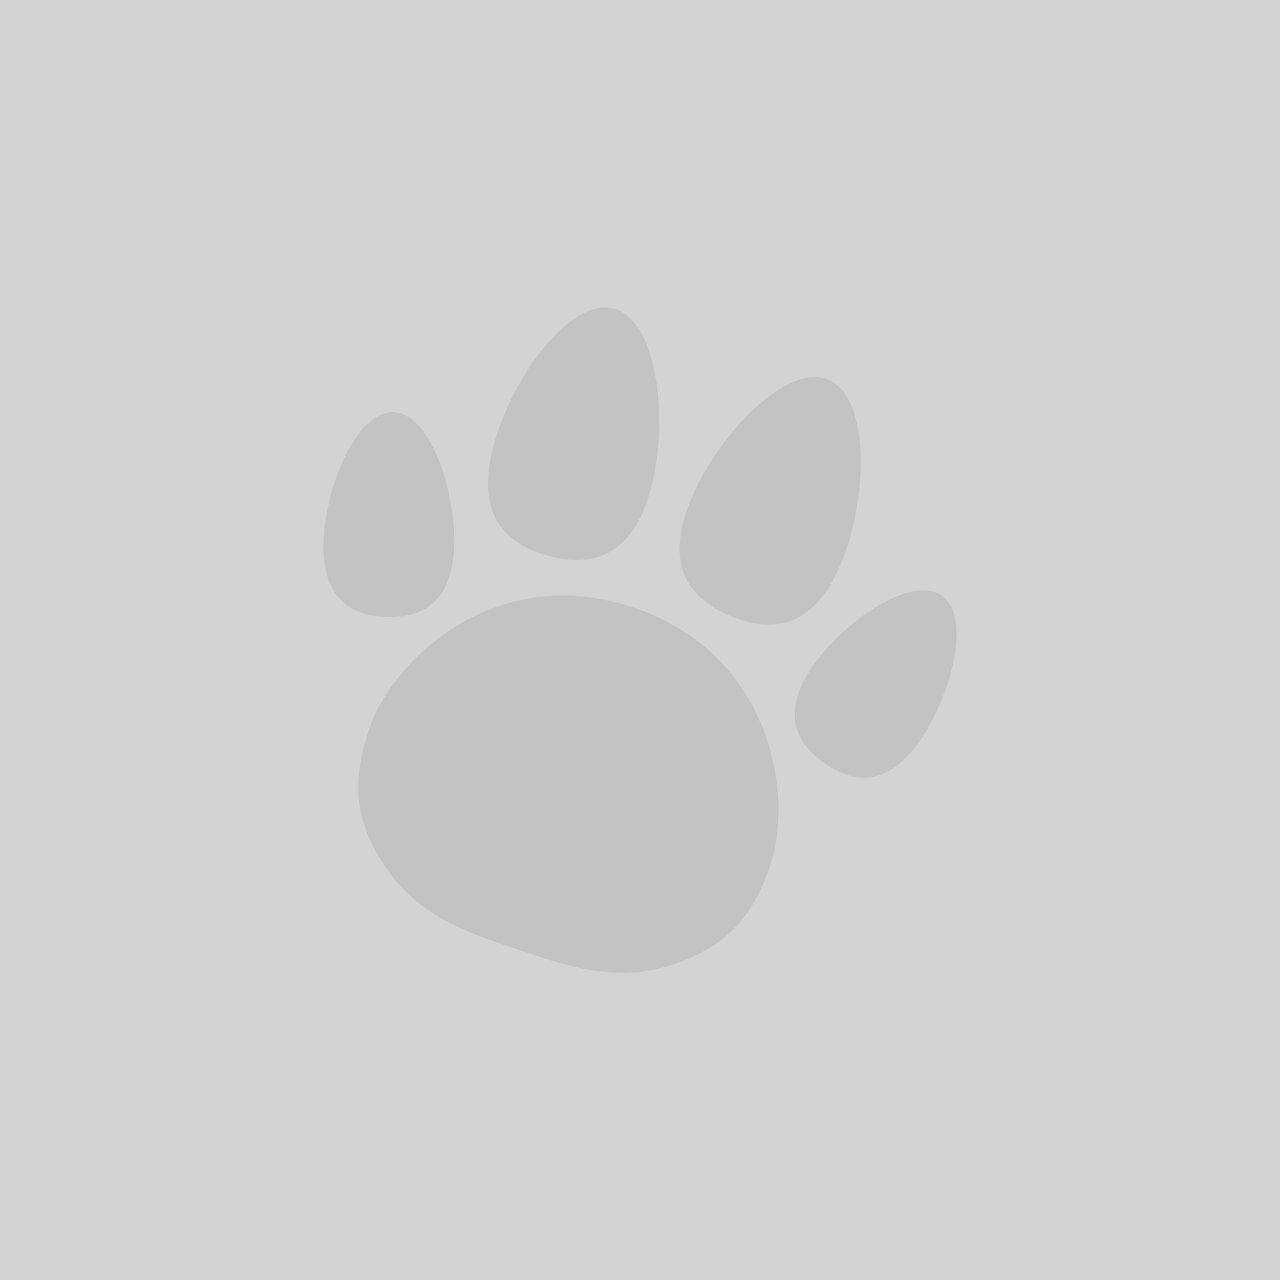 Coachies Adult Dog Training Treats 200g